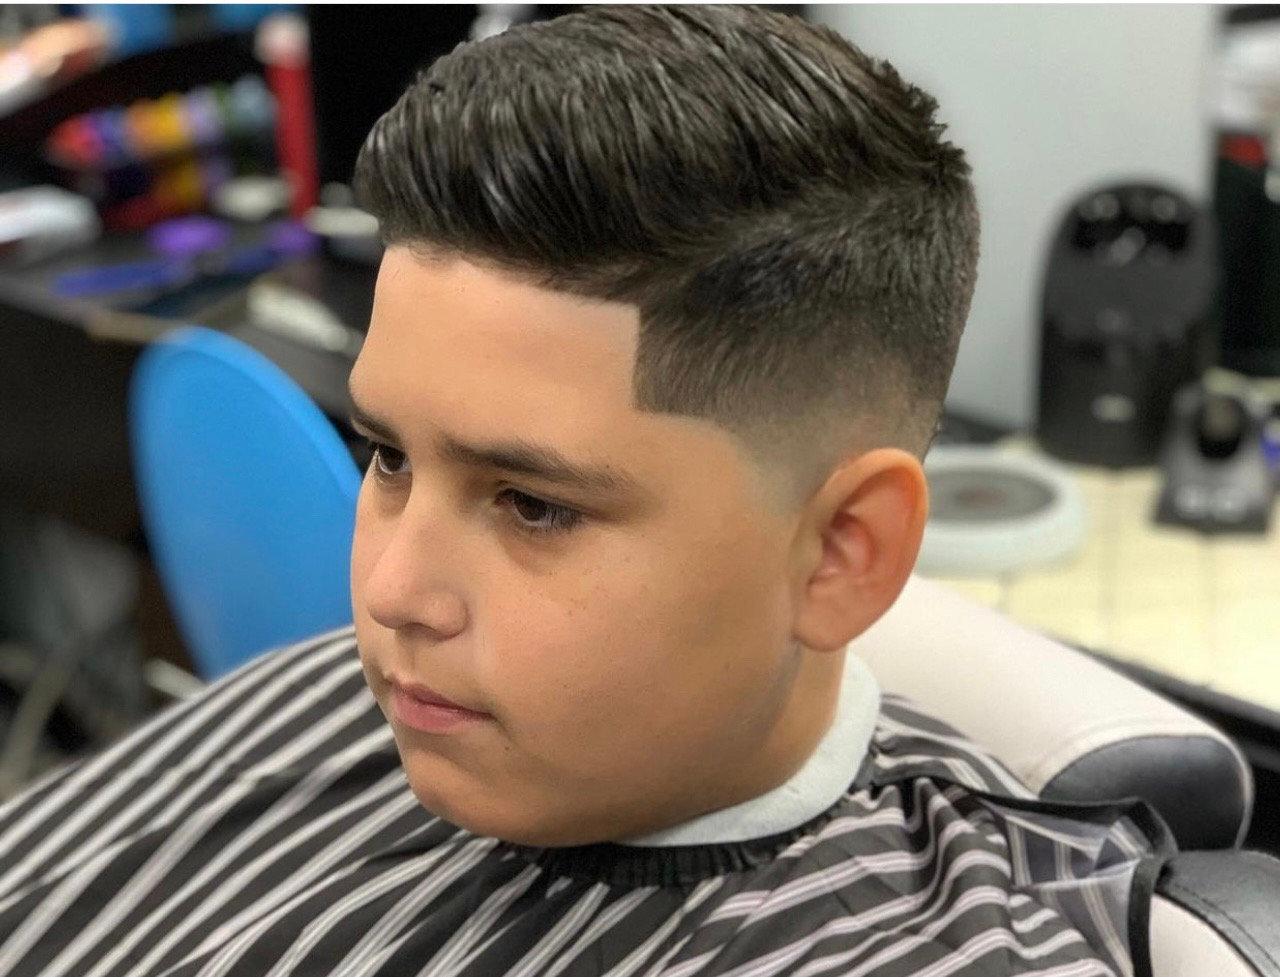 Haircuts (Teens)ages 13-17